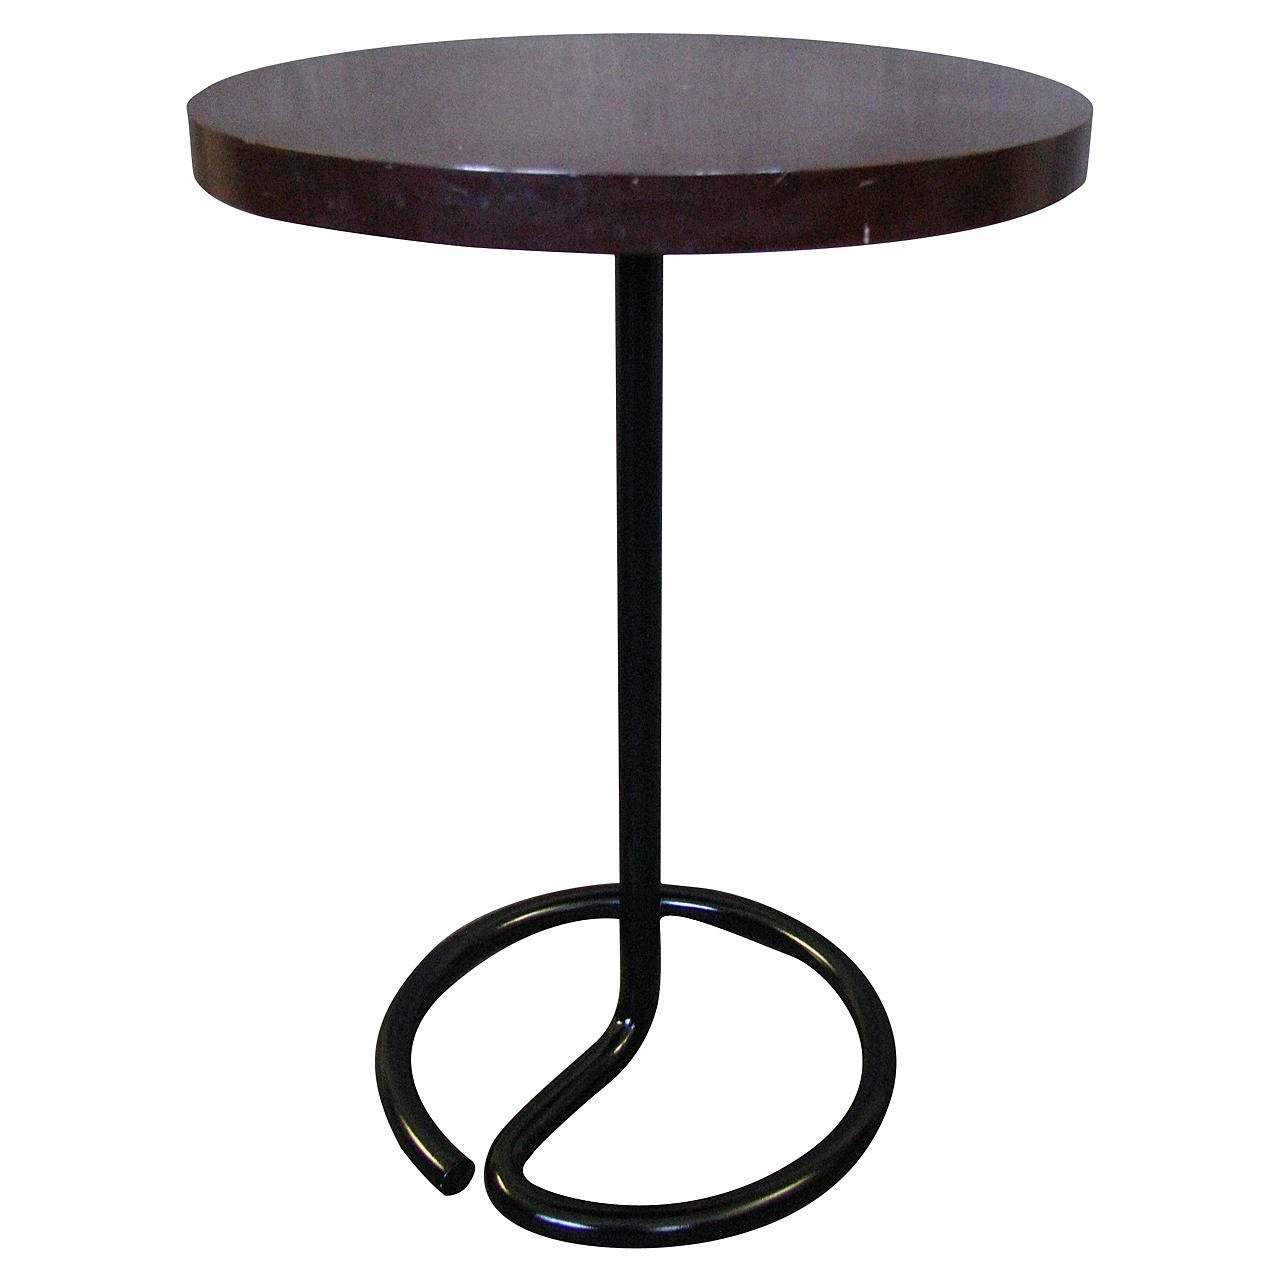 Art Deco Side Coffee Table by Rene Herbst Bakelite, 1940 For Sale